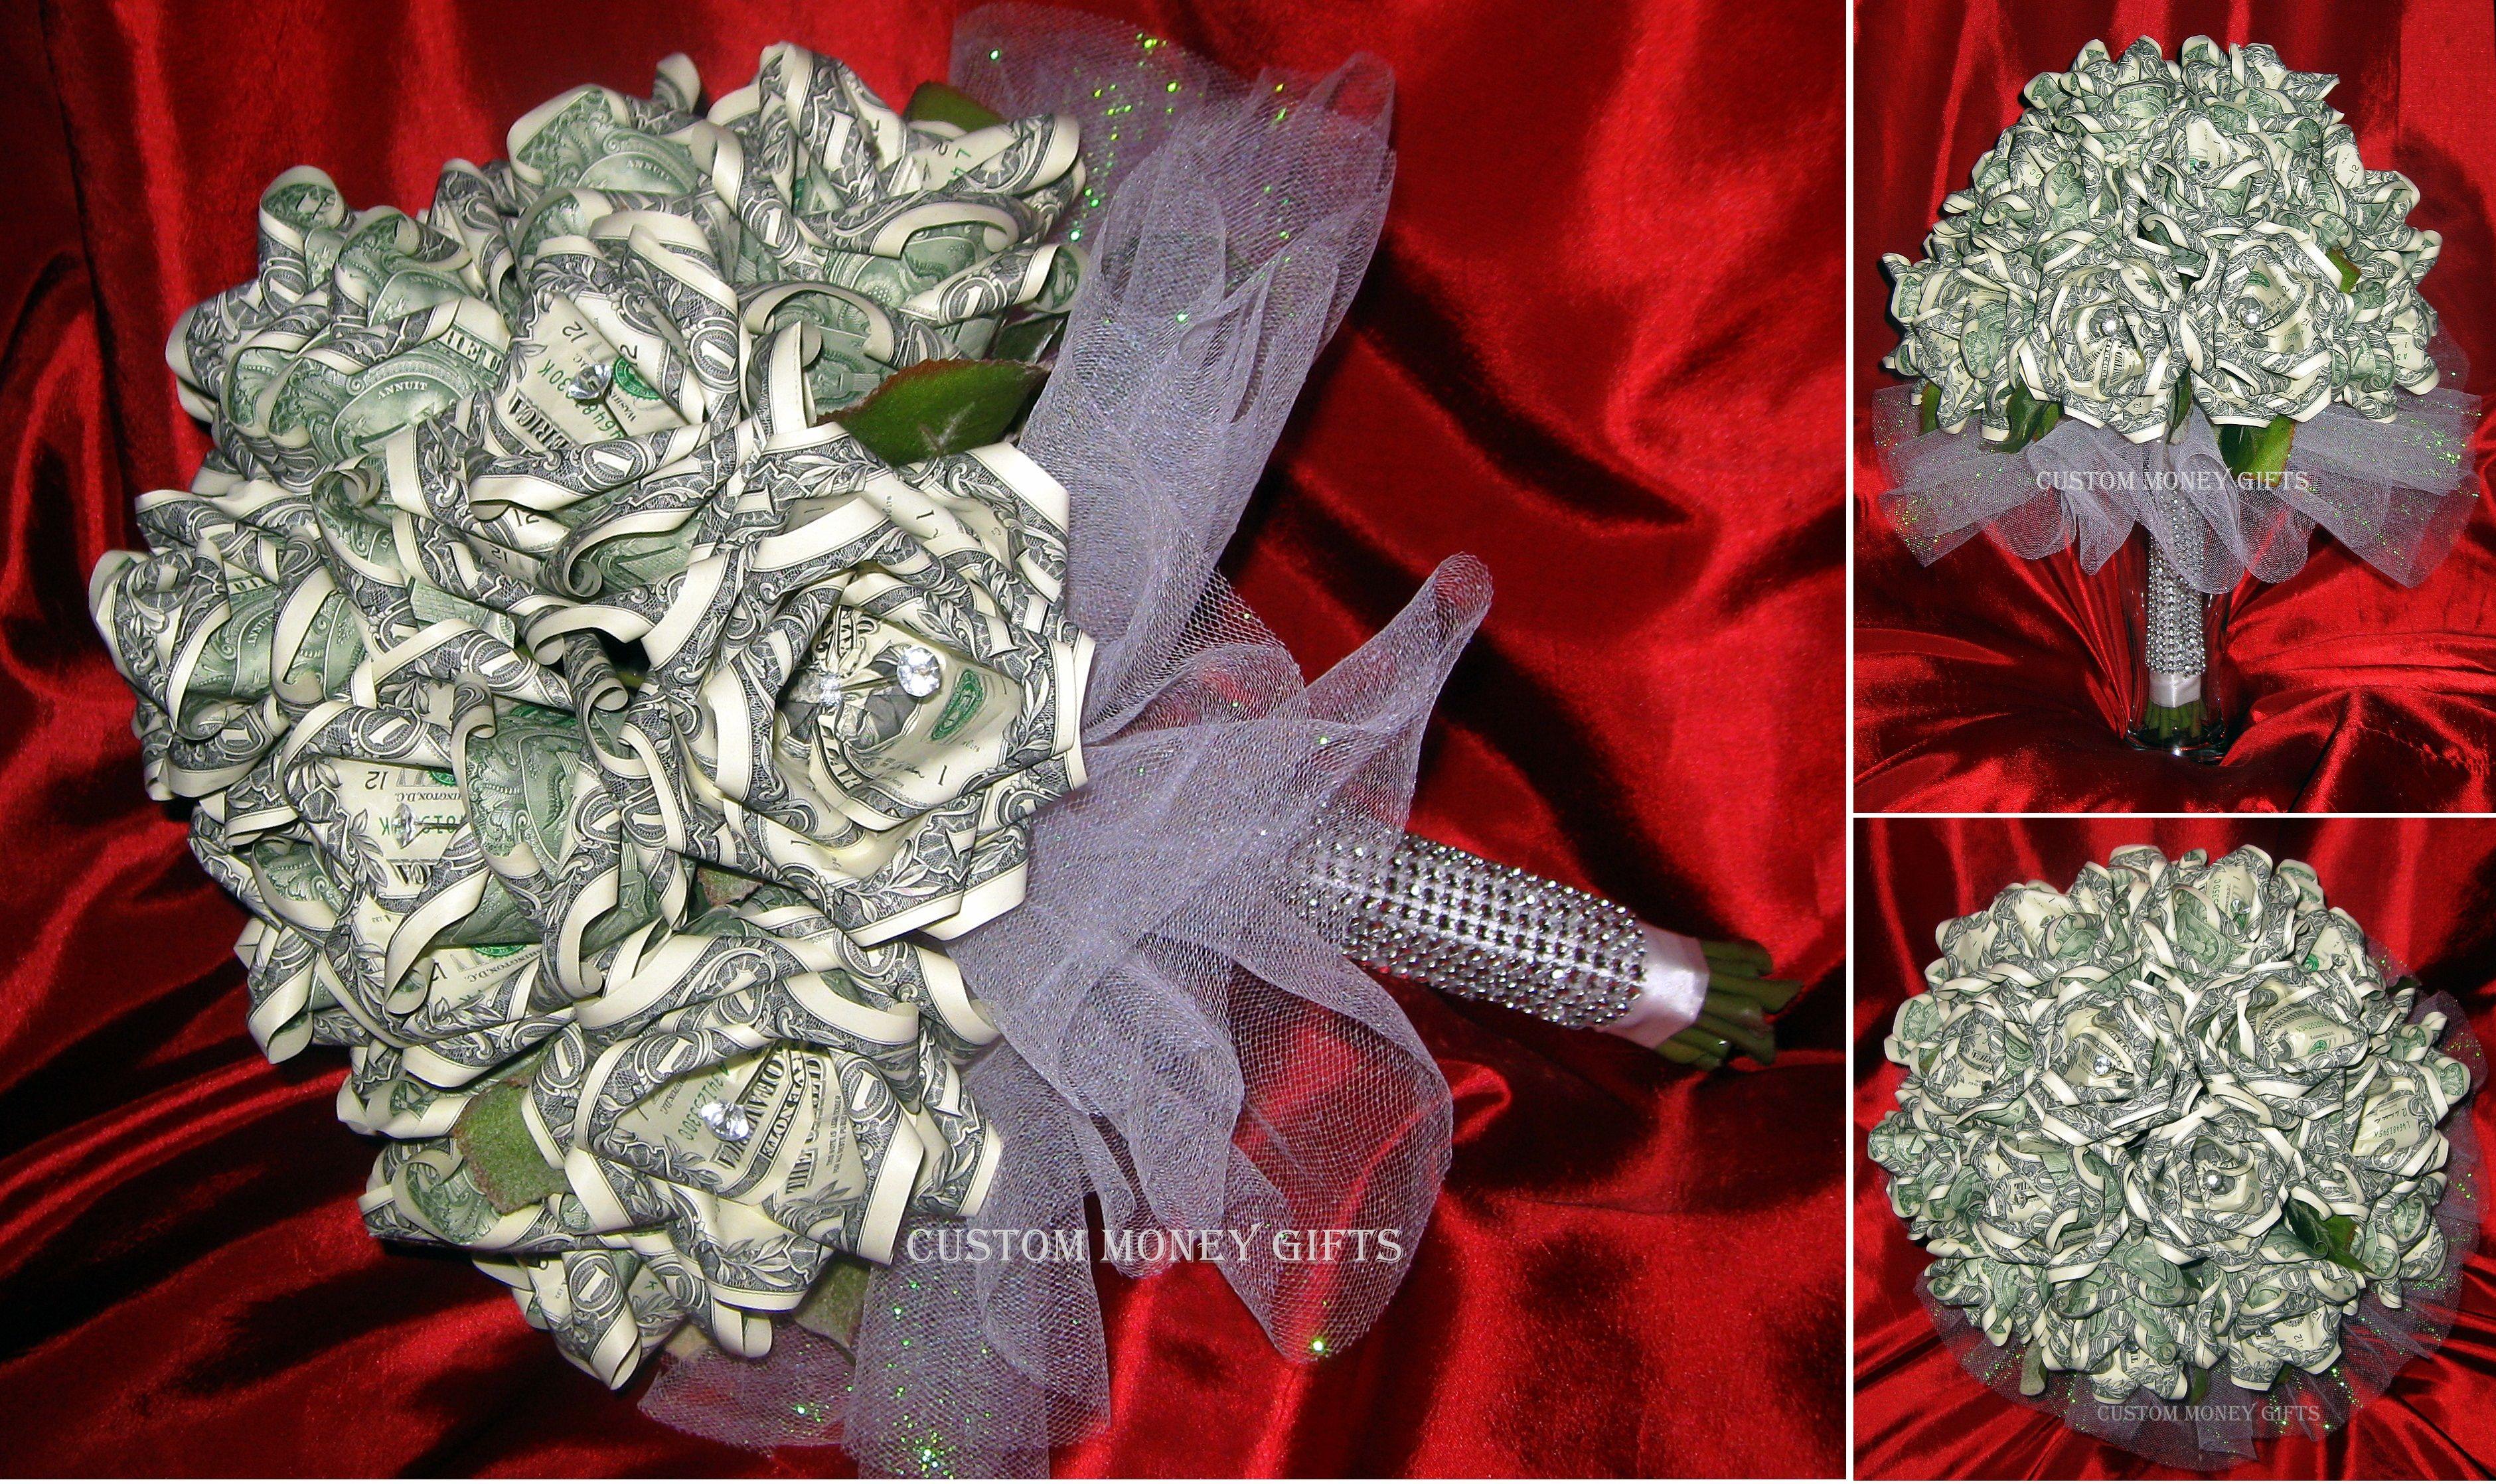 Money flower bouquet made with 100 x 1 bills loved working on money flower bouquet made with 100 x 1 bills loved working on this izmirmasajfo